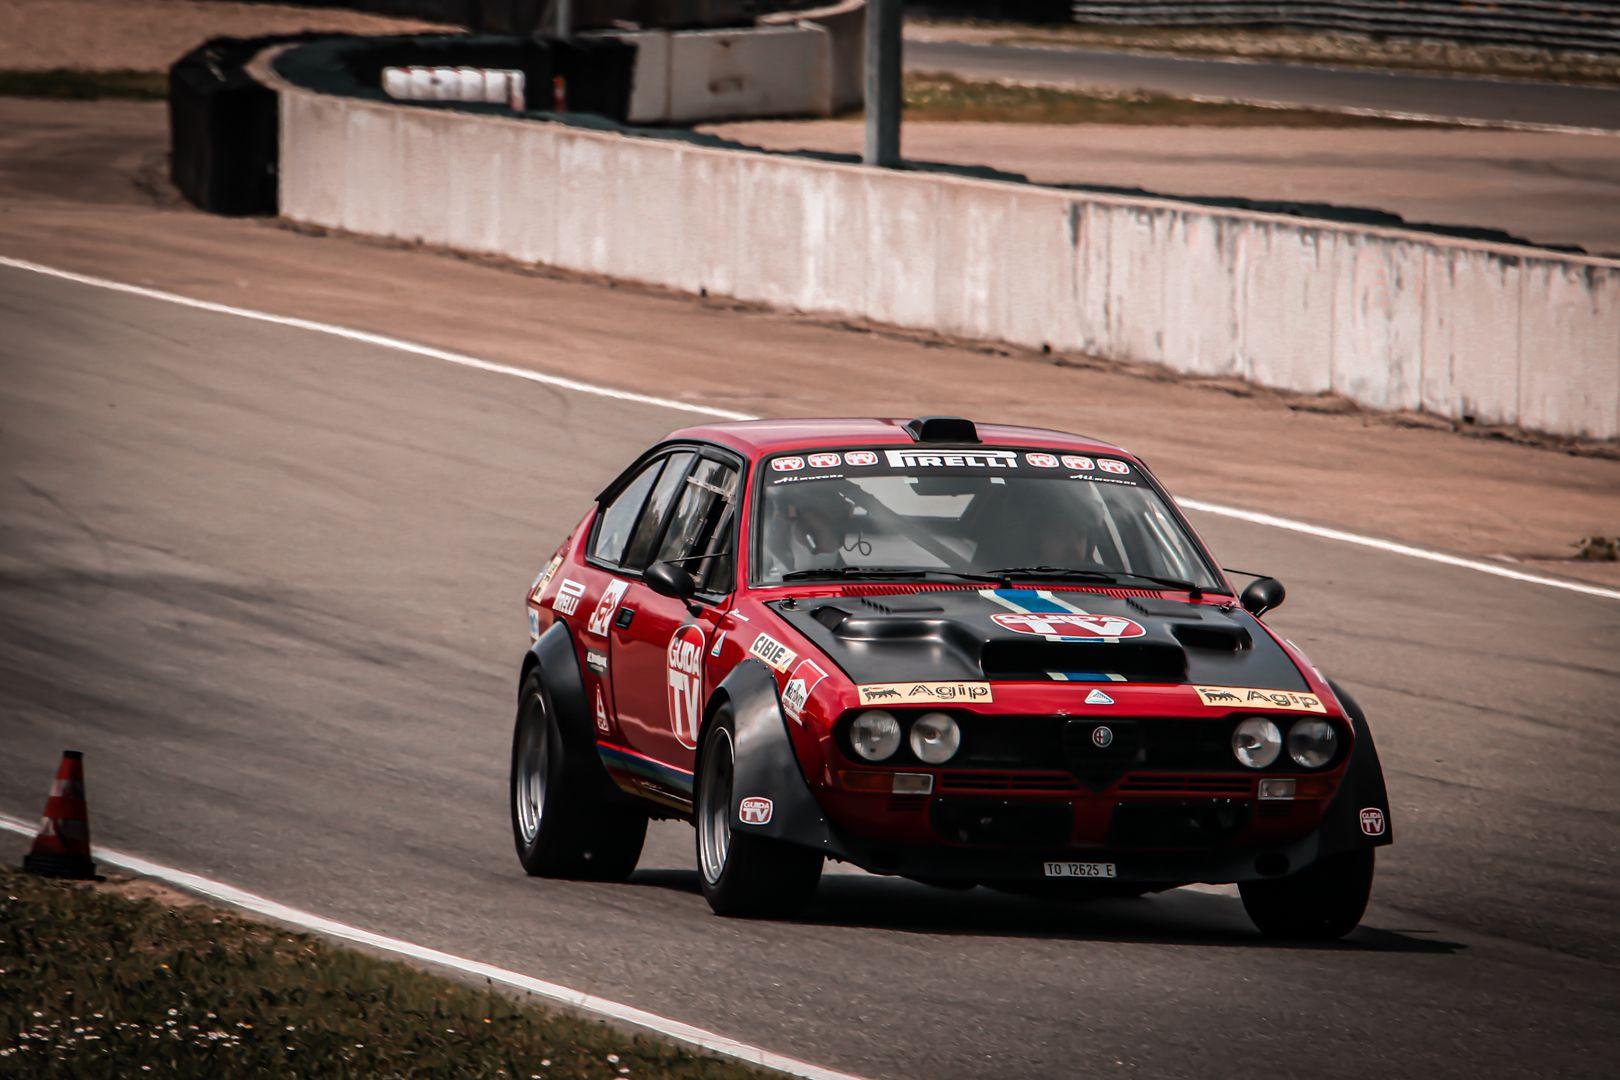 1979 Alfa Romeo Alfetta GTV Turbodelta Gr.4 71135